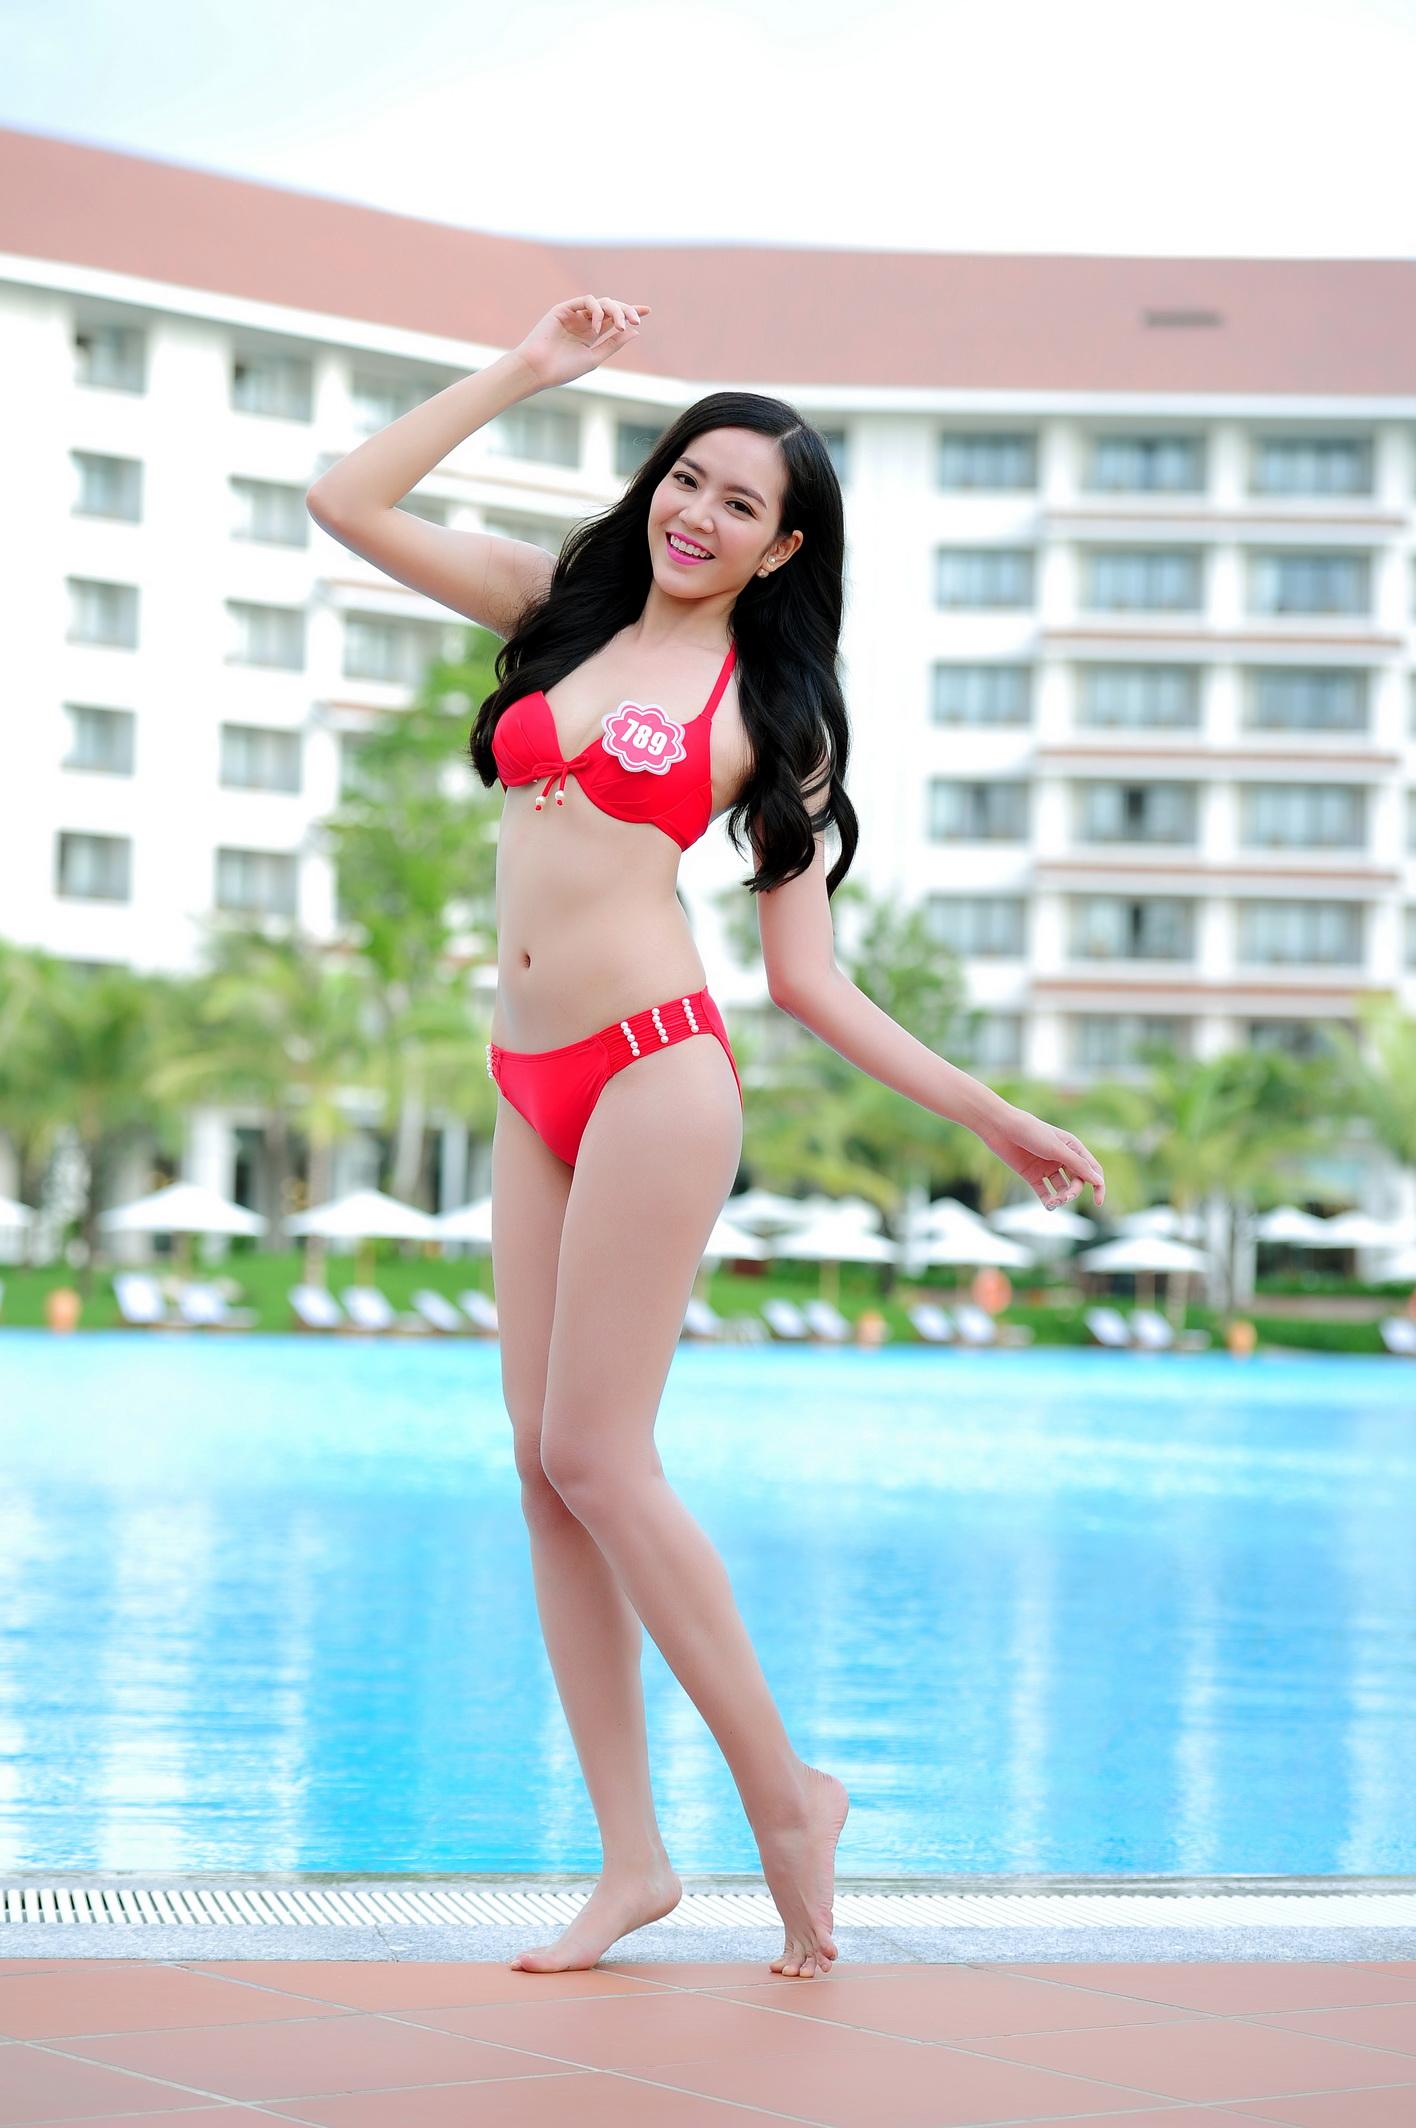 http://missvietnam.org/wp-content/uploads/ngocquy-110-2.jpg